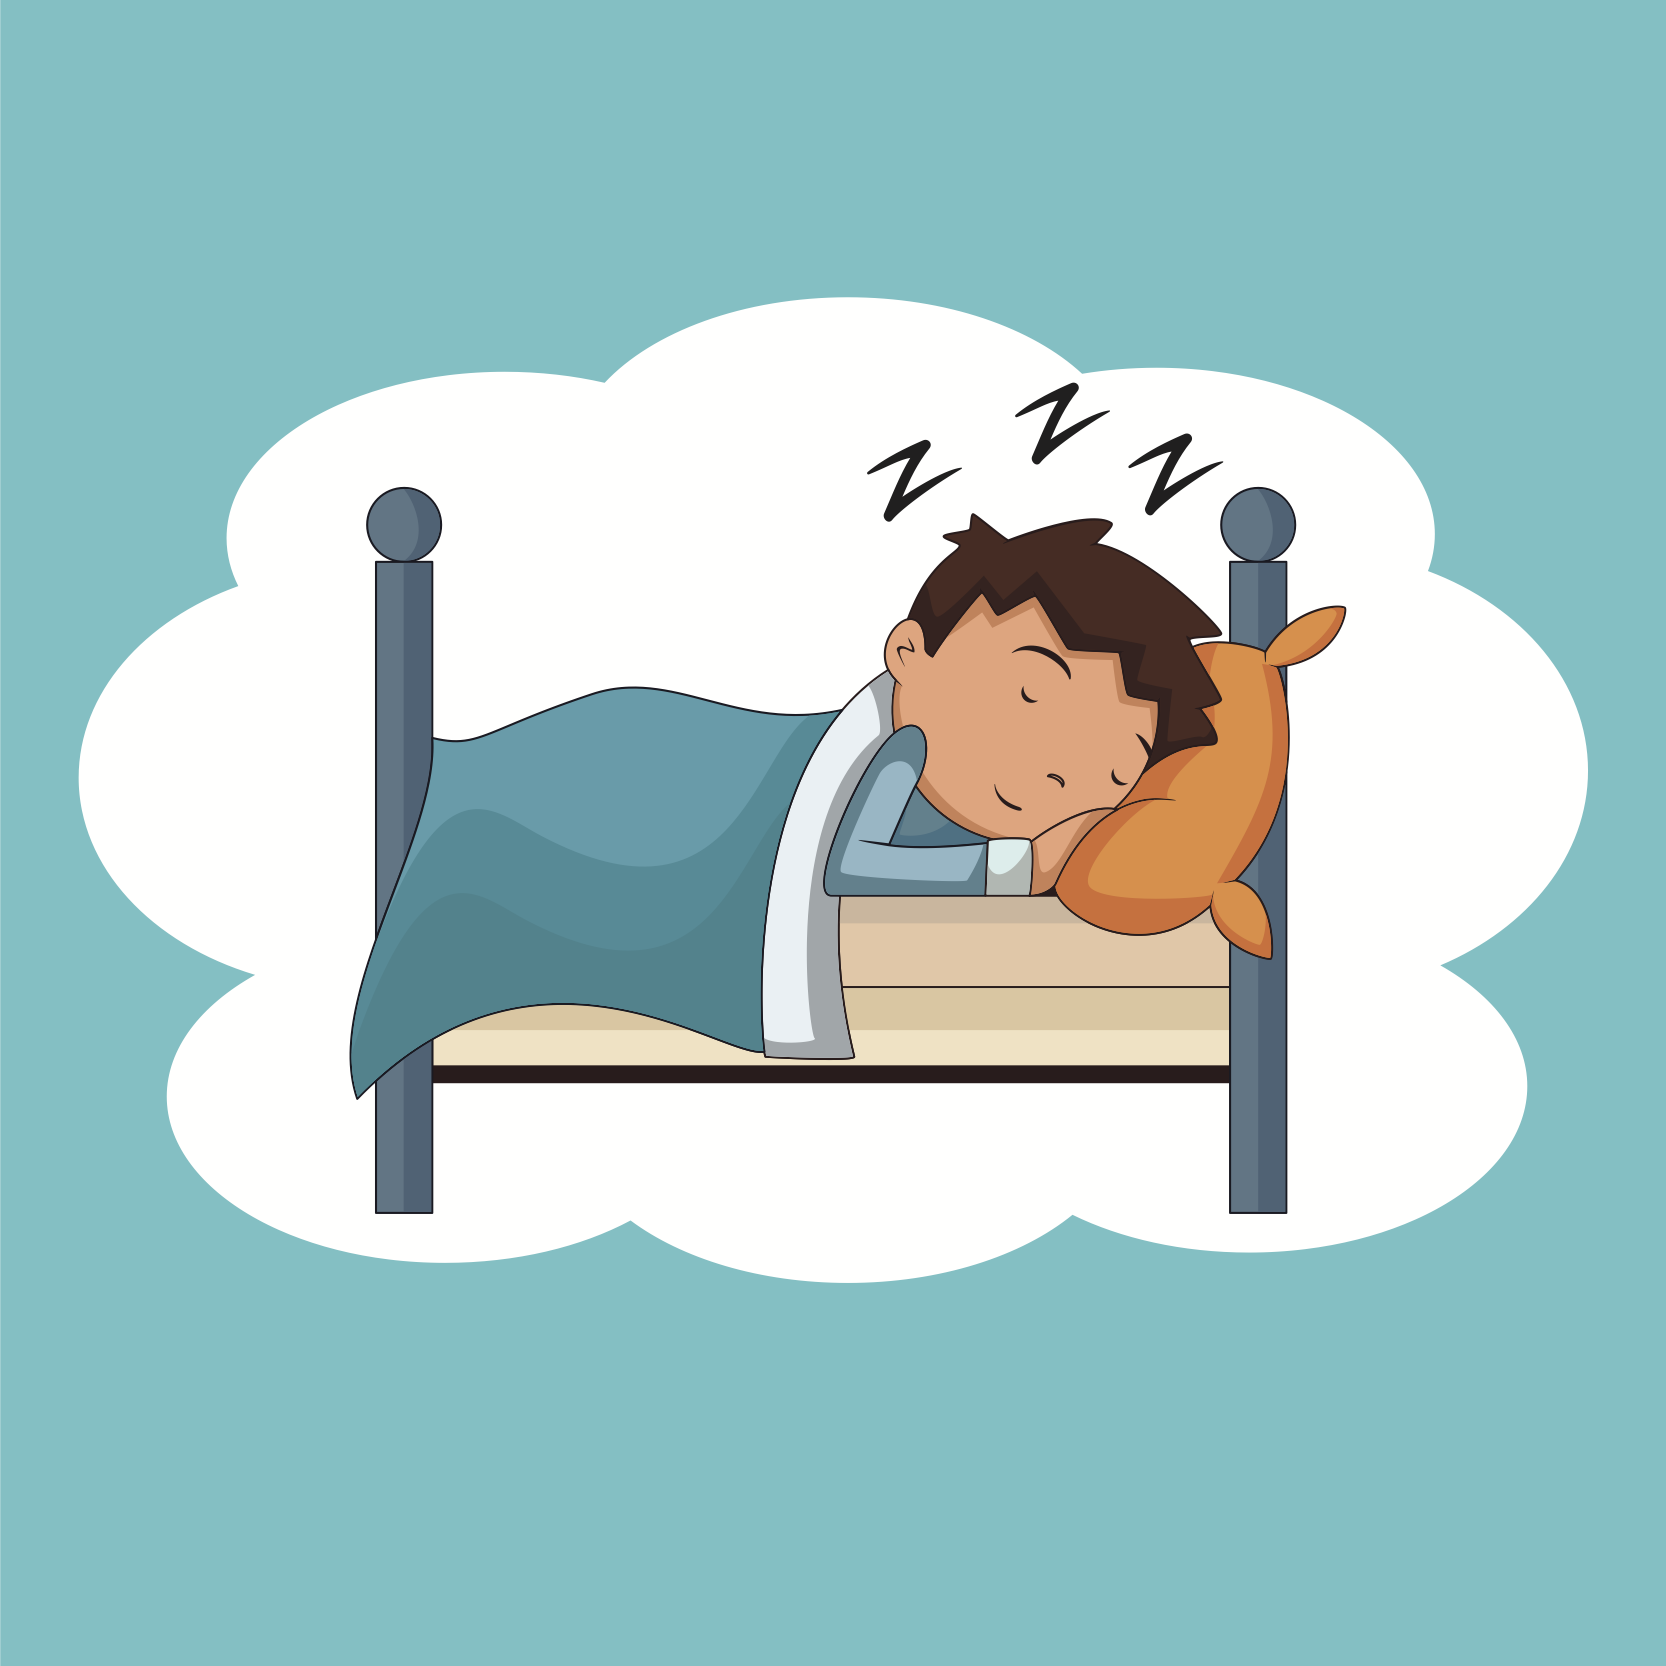 Sleeping clipart sleep hygiene. Why do we need